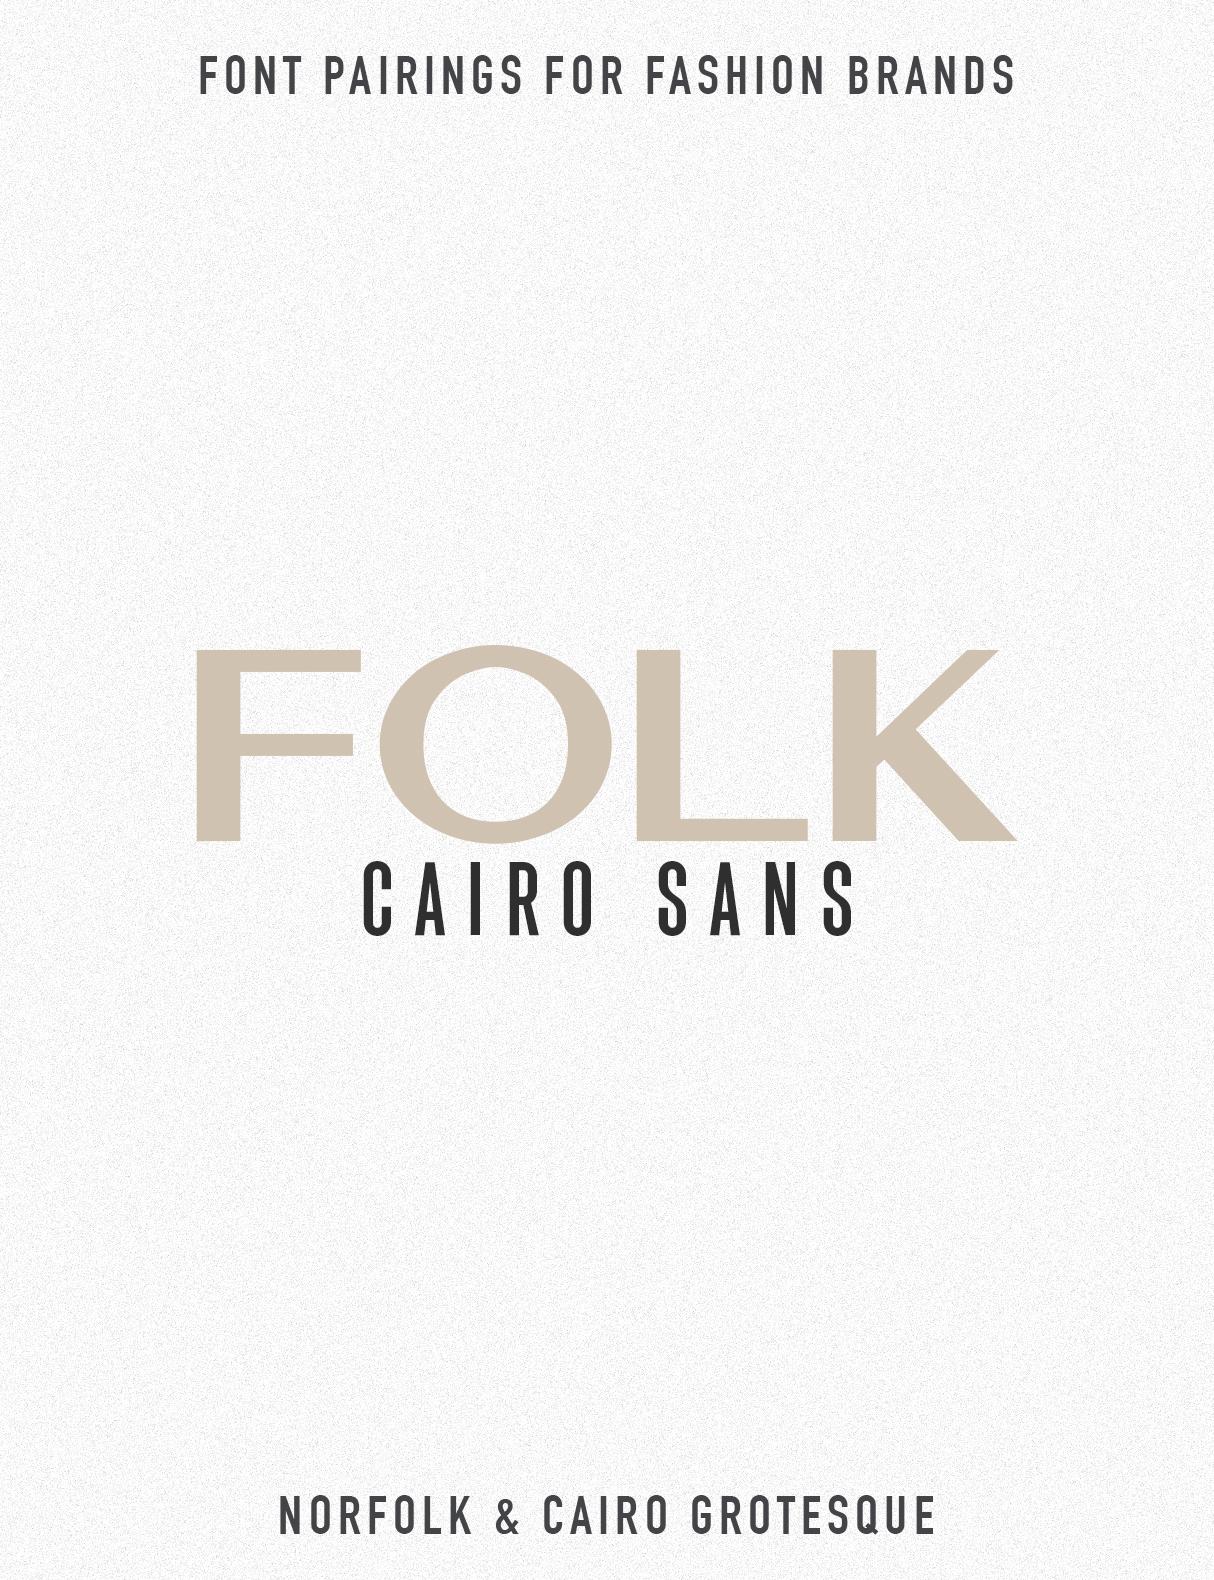 Jen Wagner Fashion Brand Font Pairings | Norfolk Cairo